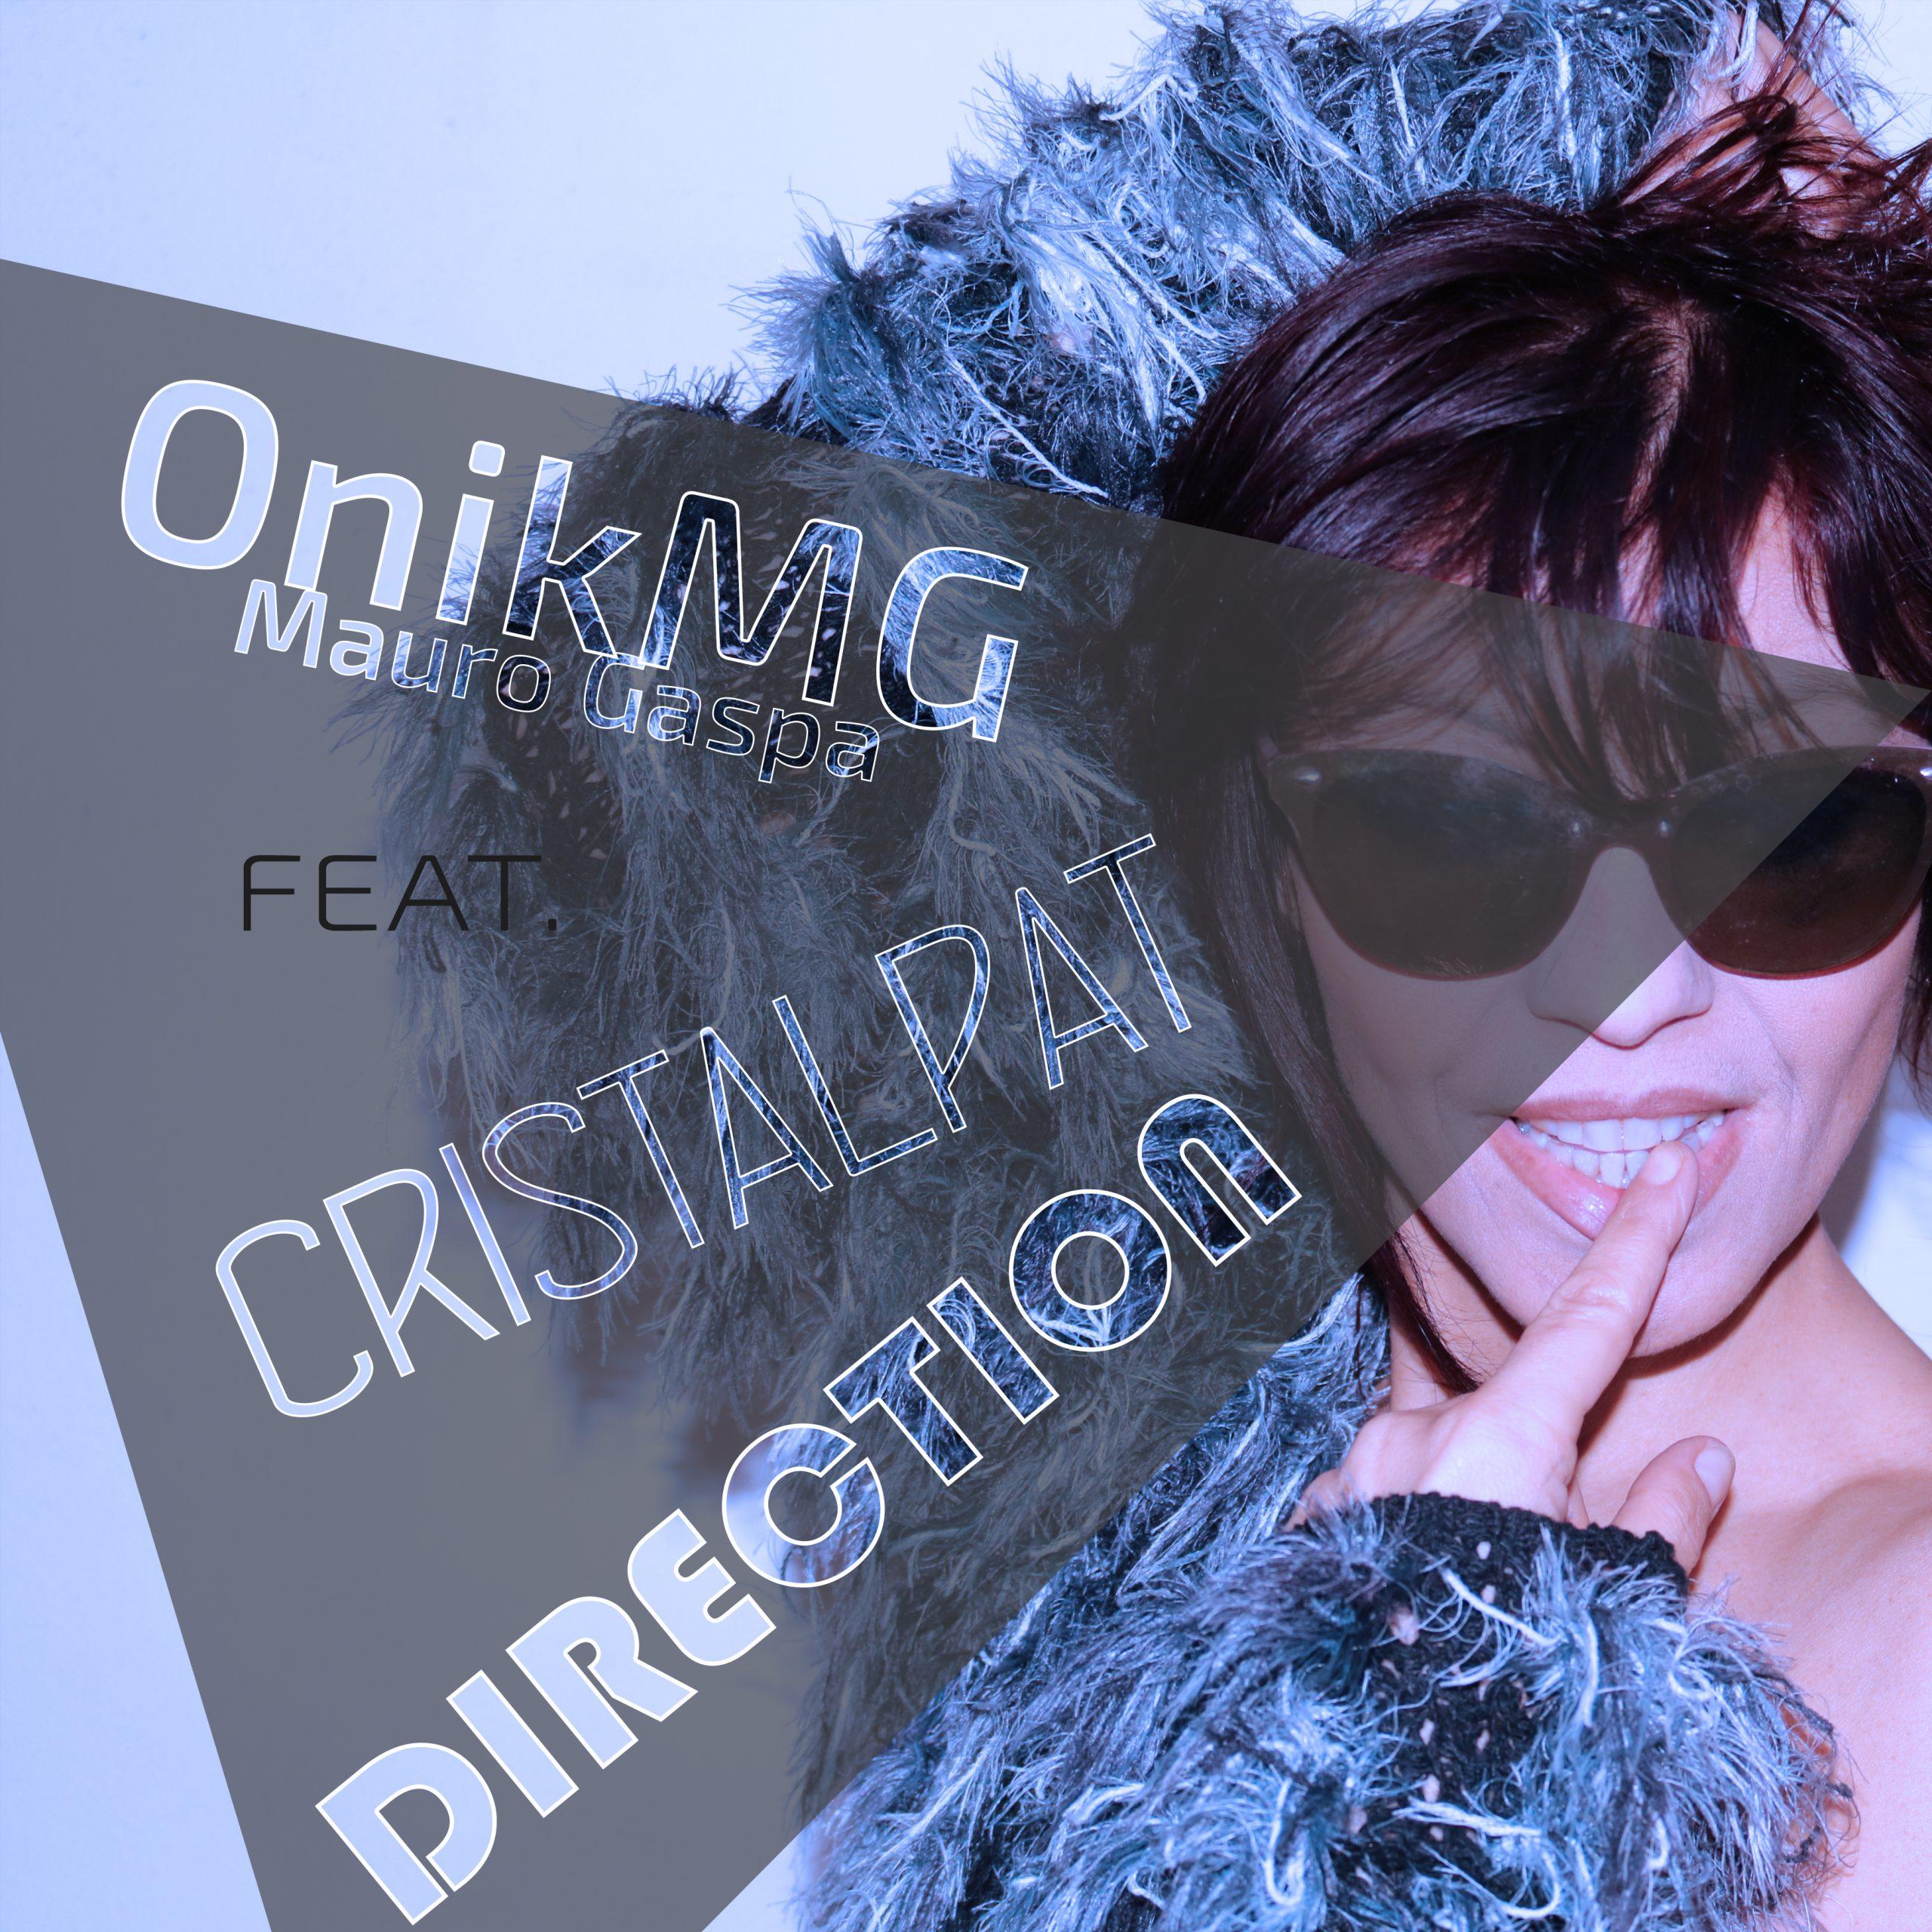 Direction - OnikMG feat. Cristalpat